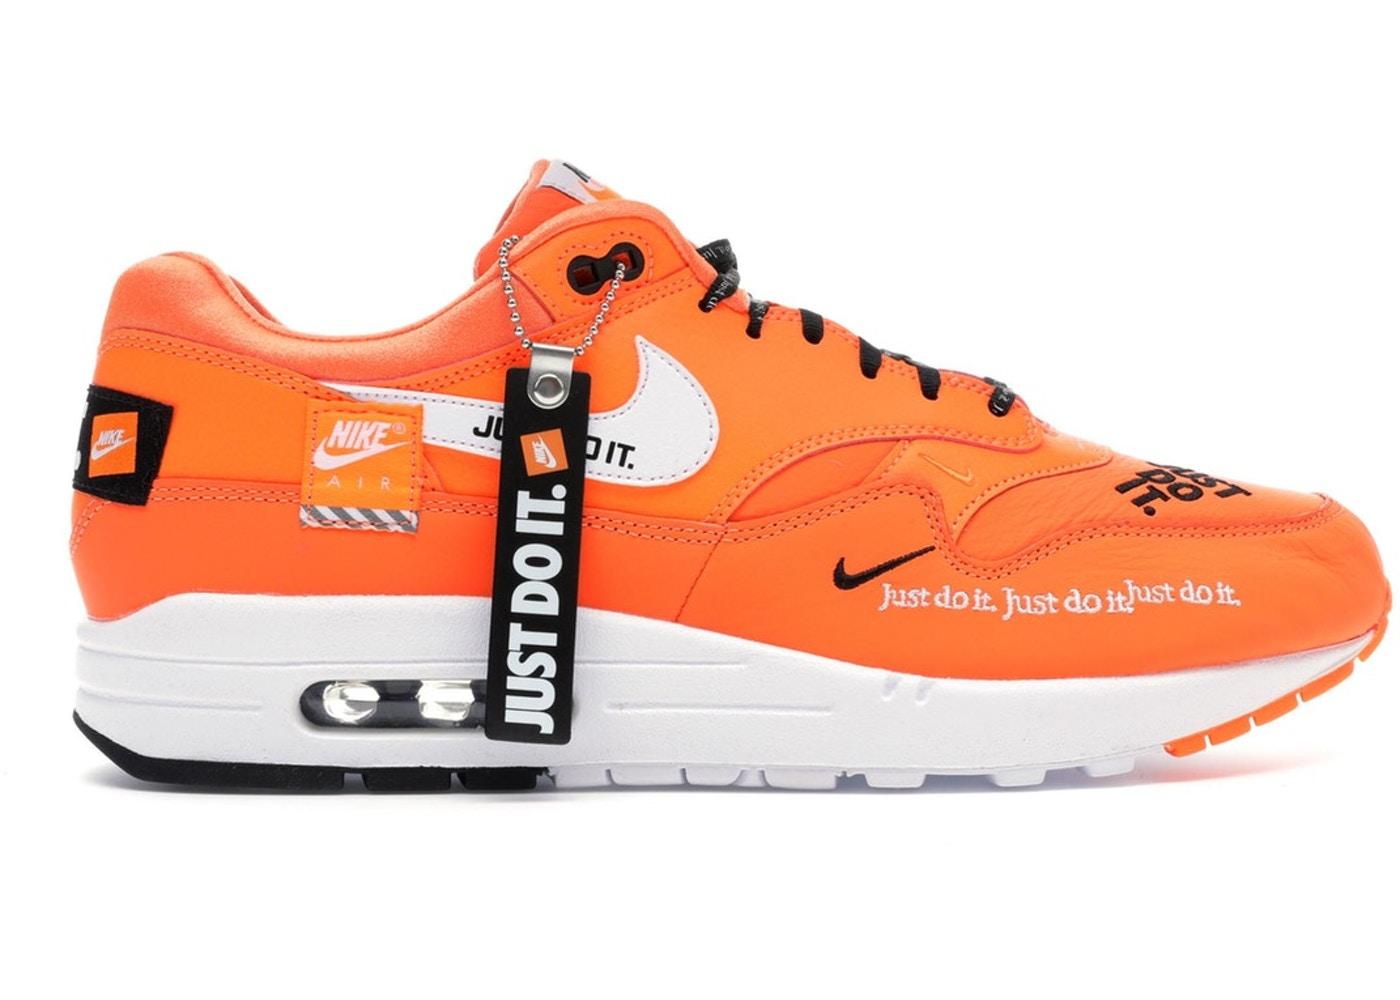 Gracias demasiado Tomate  On Sale: Nike Air Max 1 Just Do It